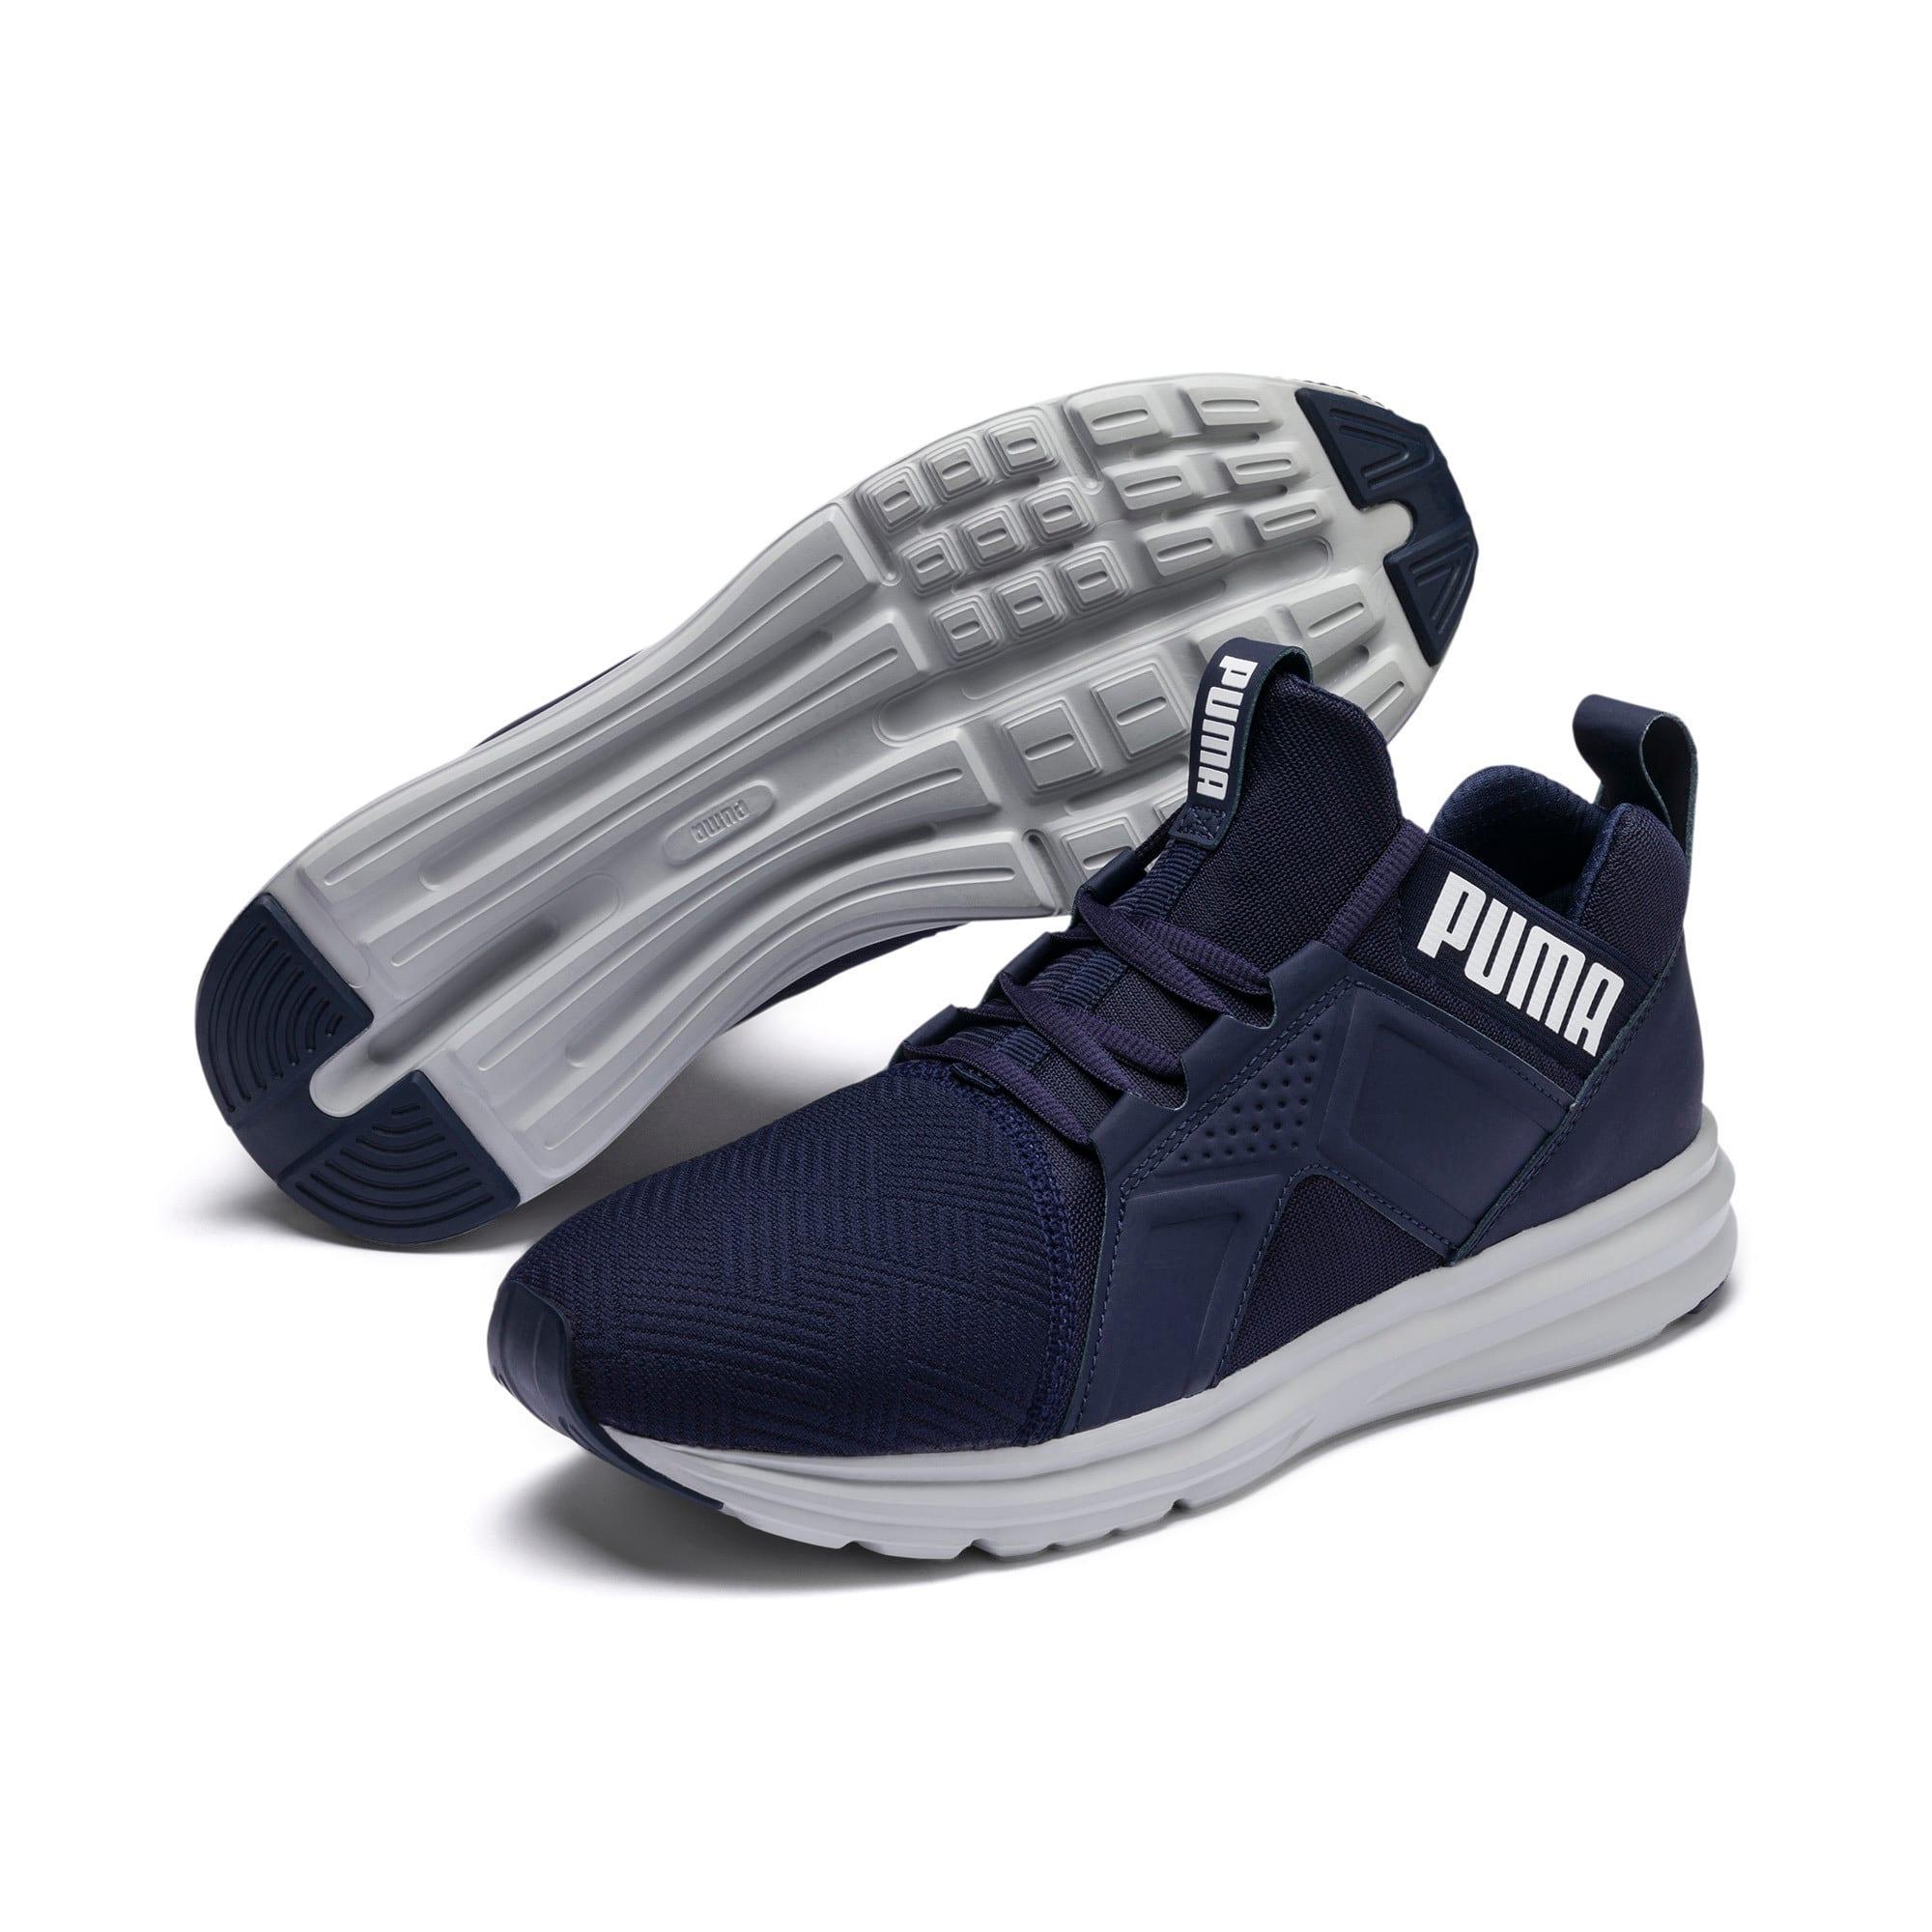 Thumbnail 2 of Enzo Geo Men's Sneakers, Peacoat, medium